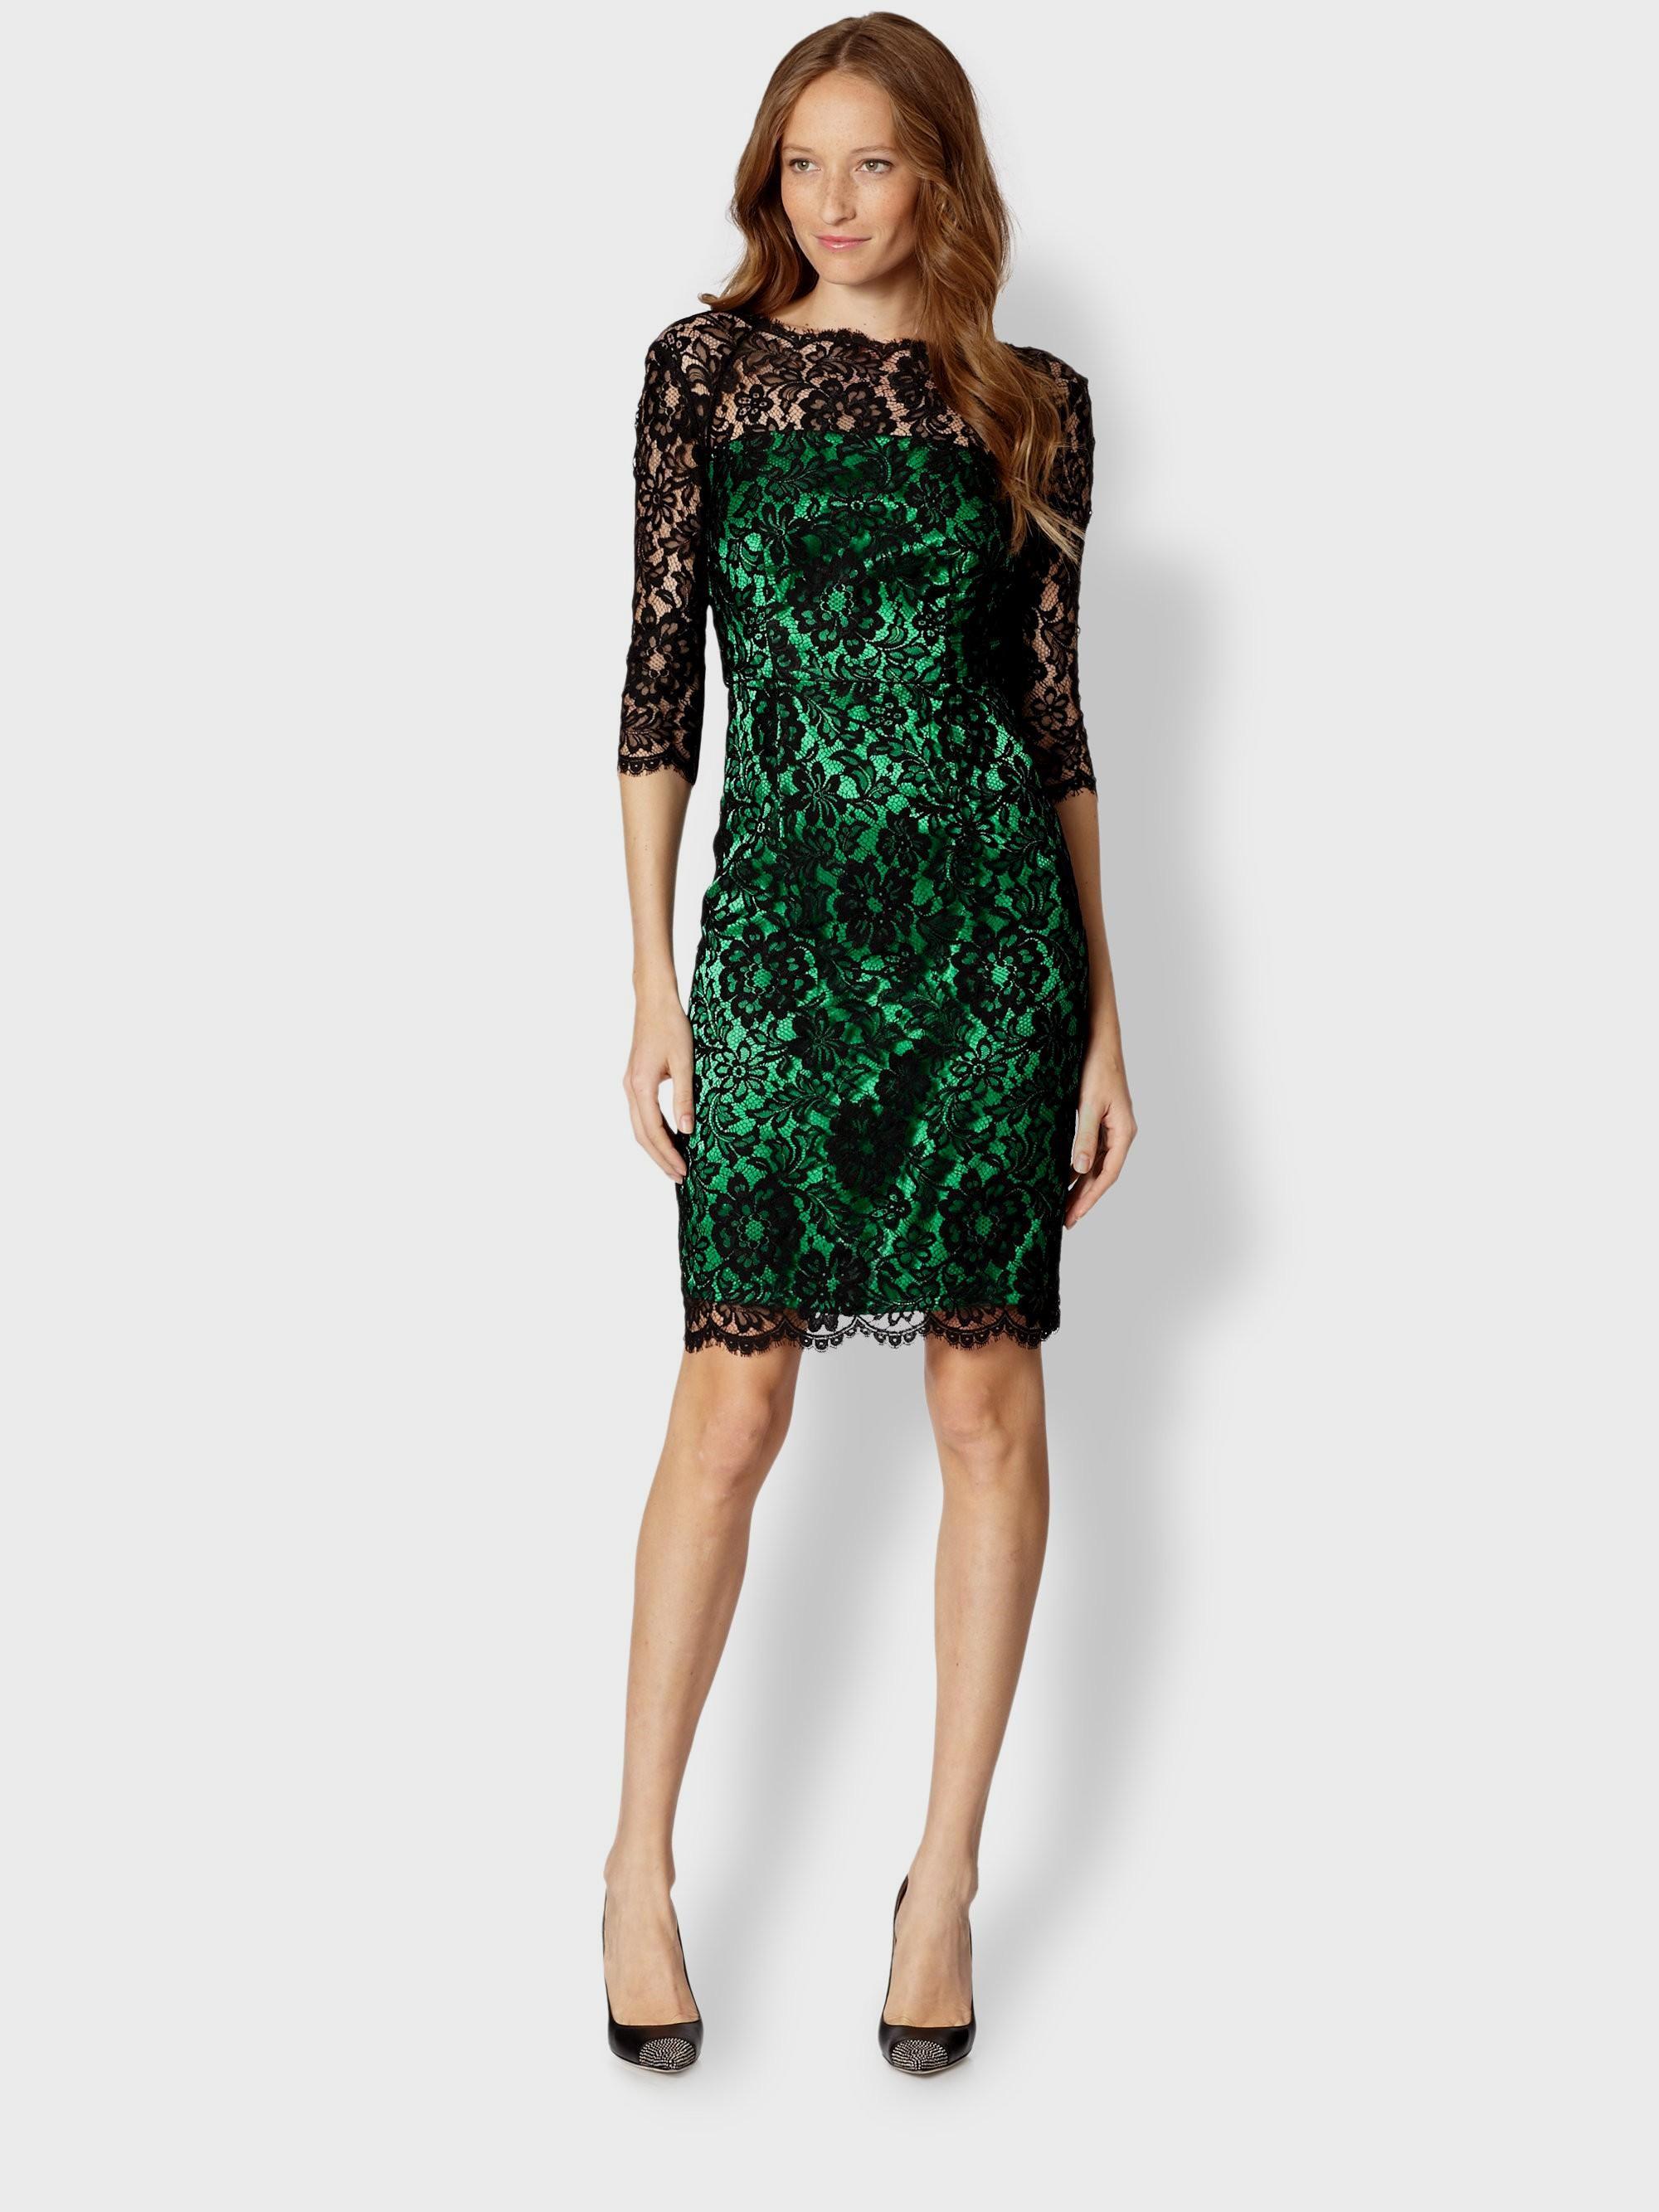 - Dresses Ask